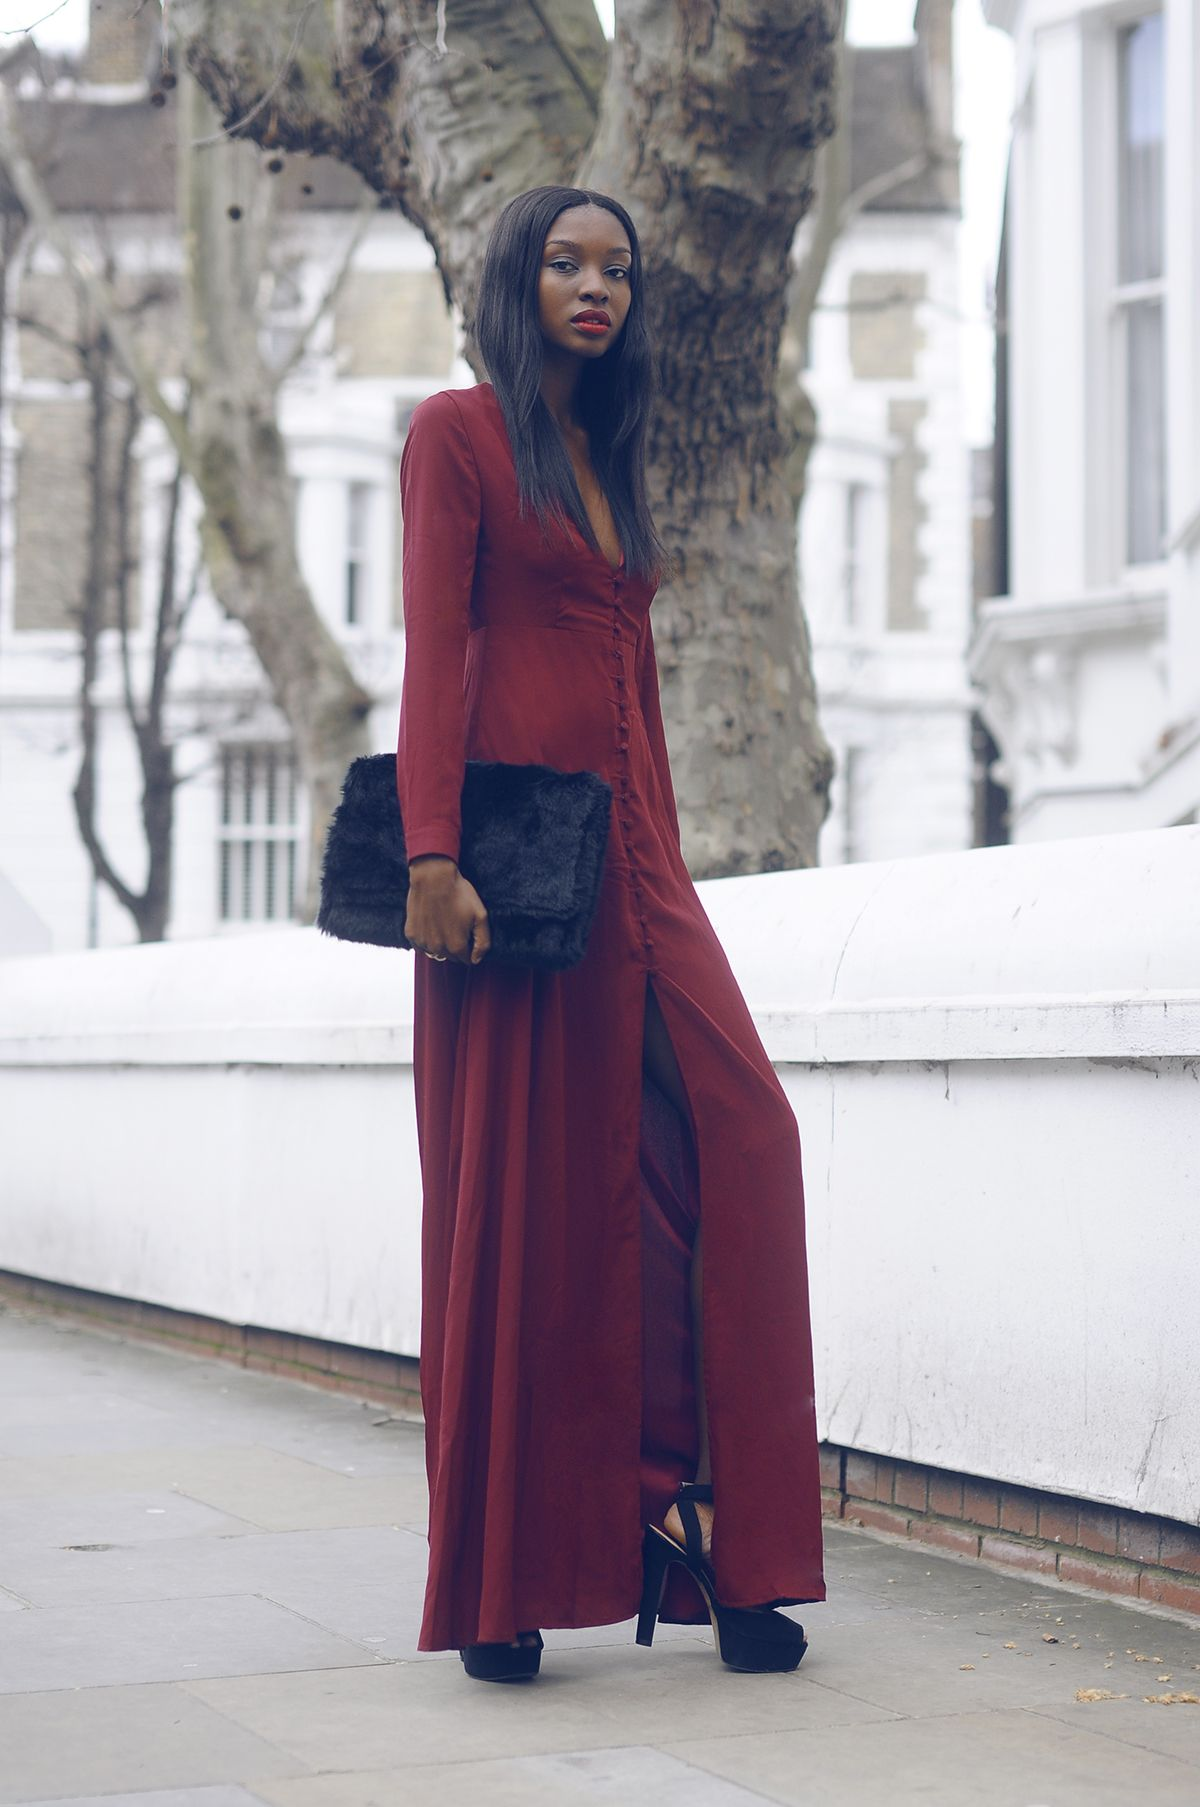 Missguided dress & bag. Zara heels.